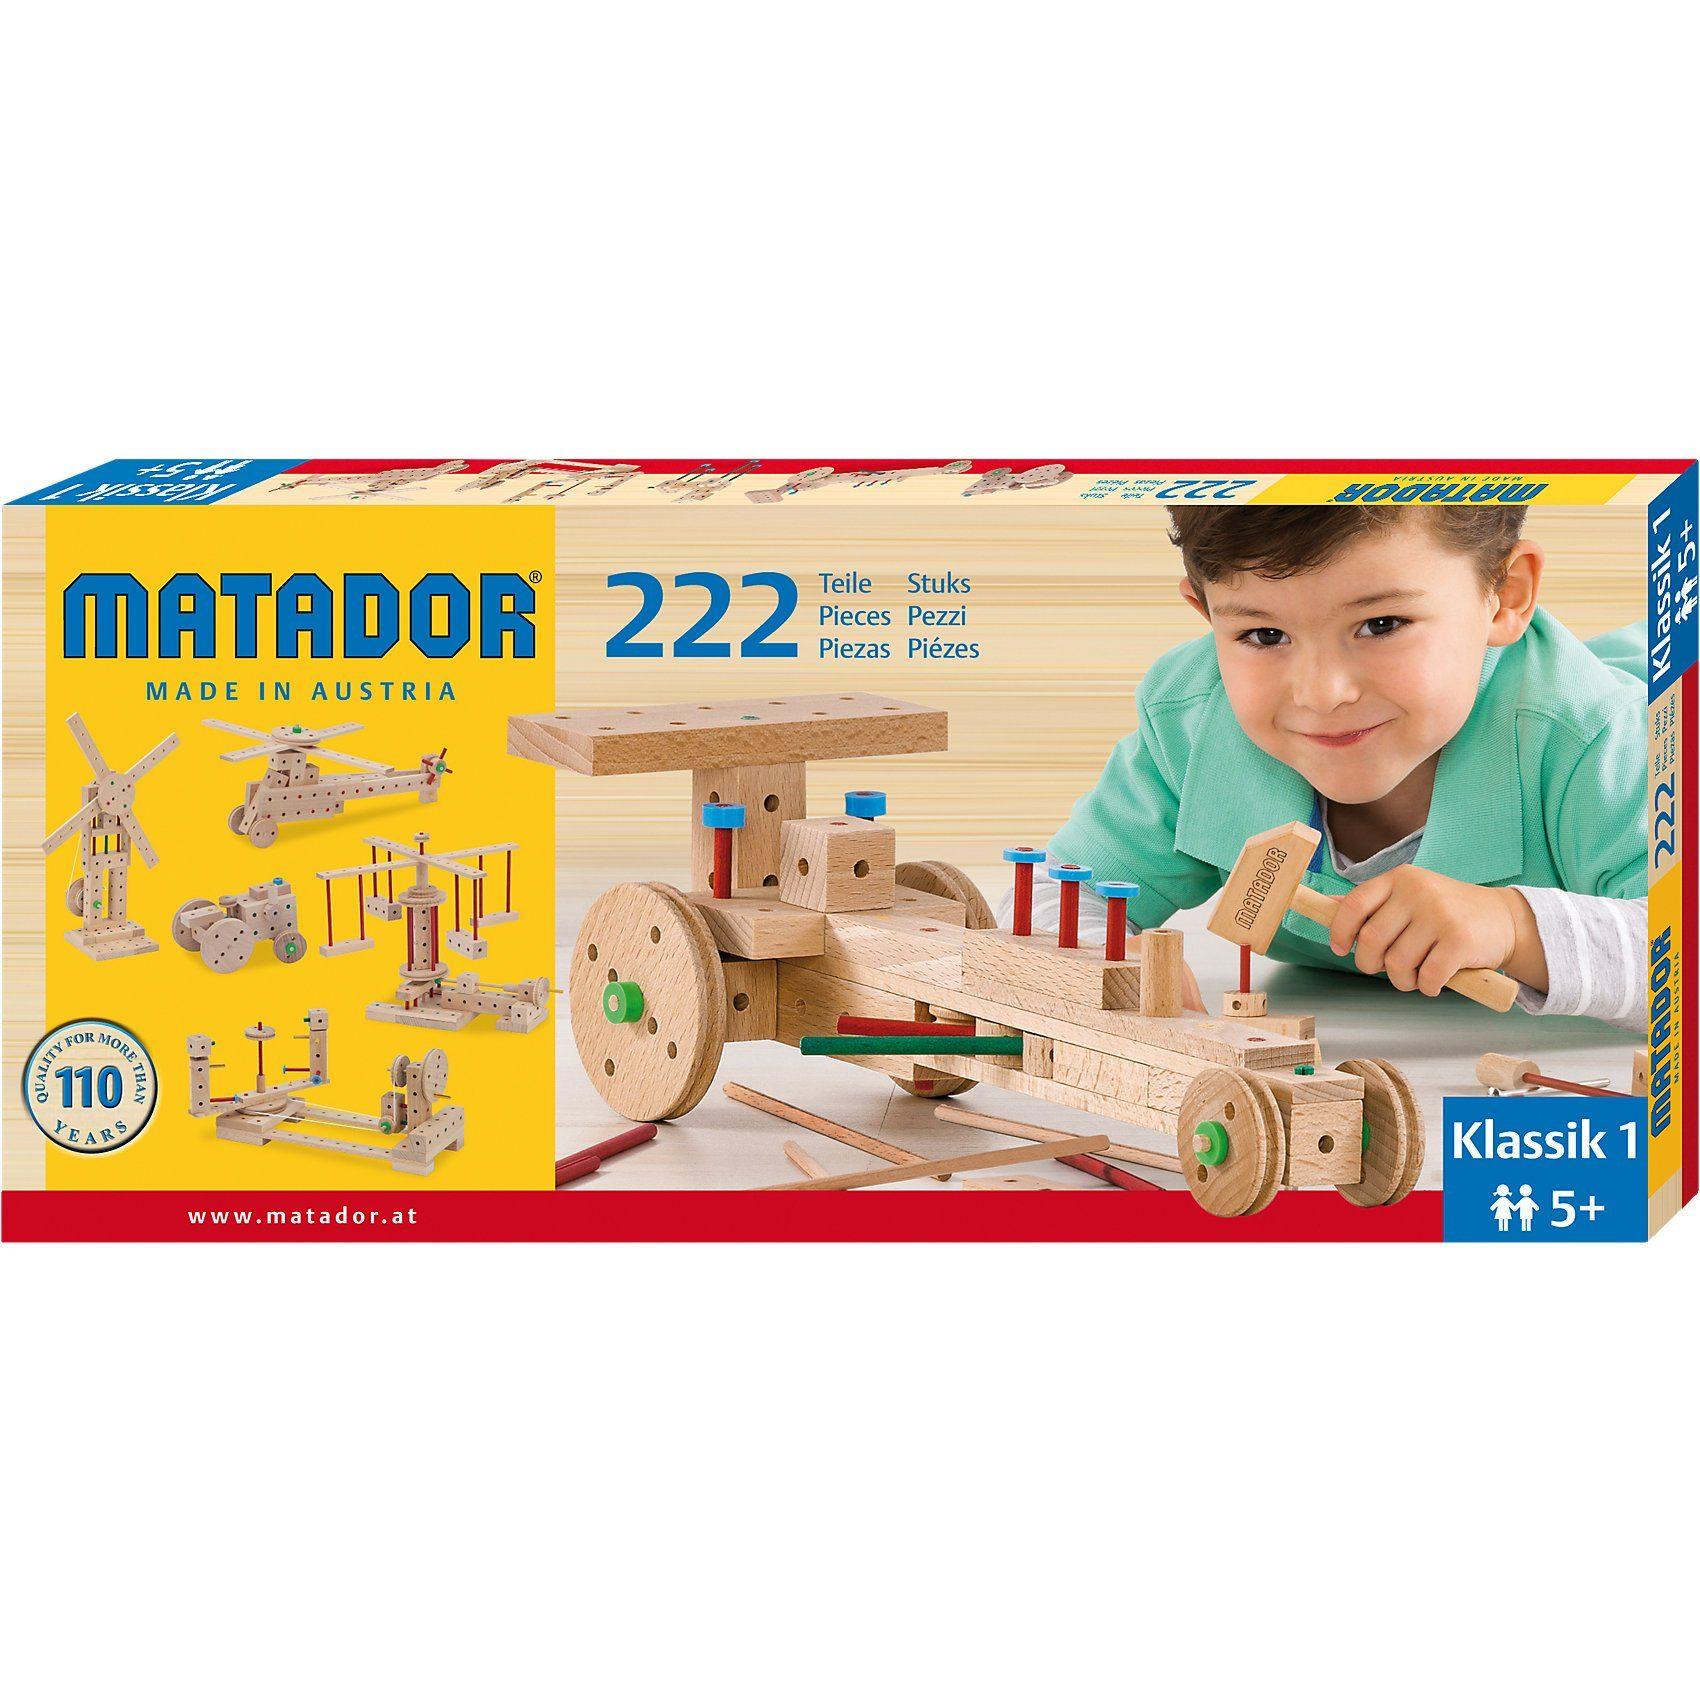 Matador Klassic Nr.1, 222 Teile